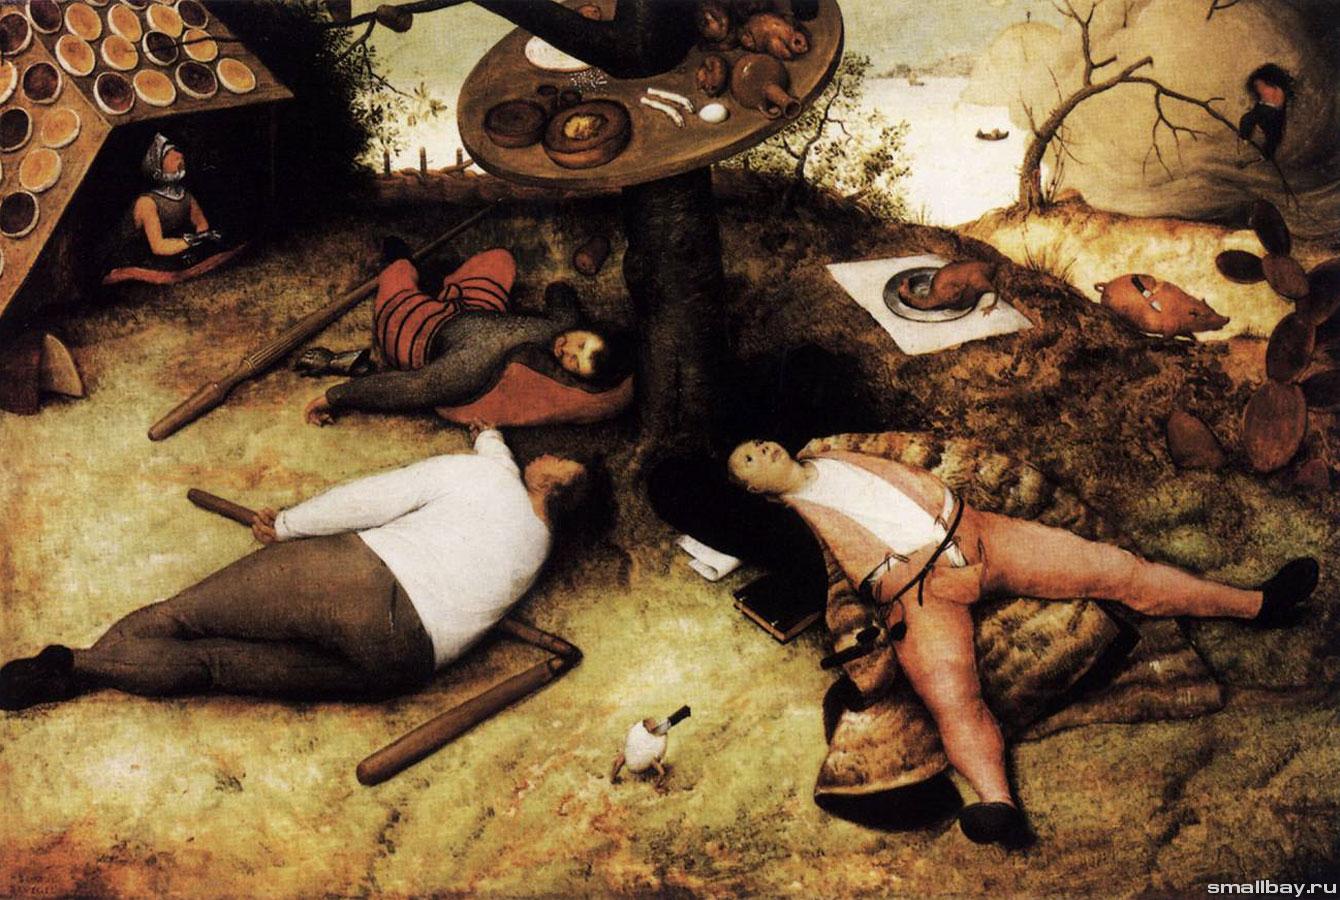 Картинки по запросу Фрагмент картины Питера Брейгеля «Страна лентяев»